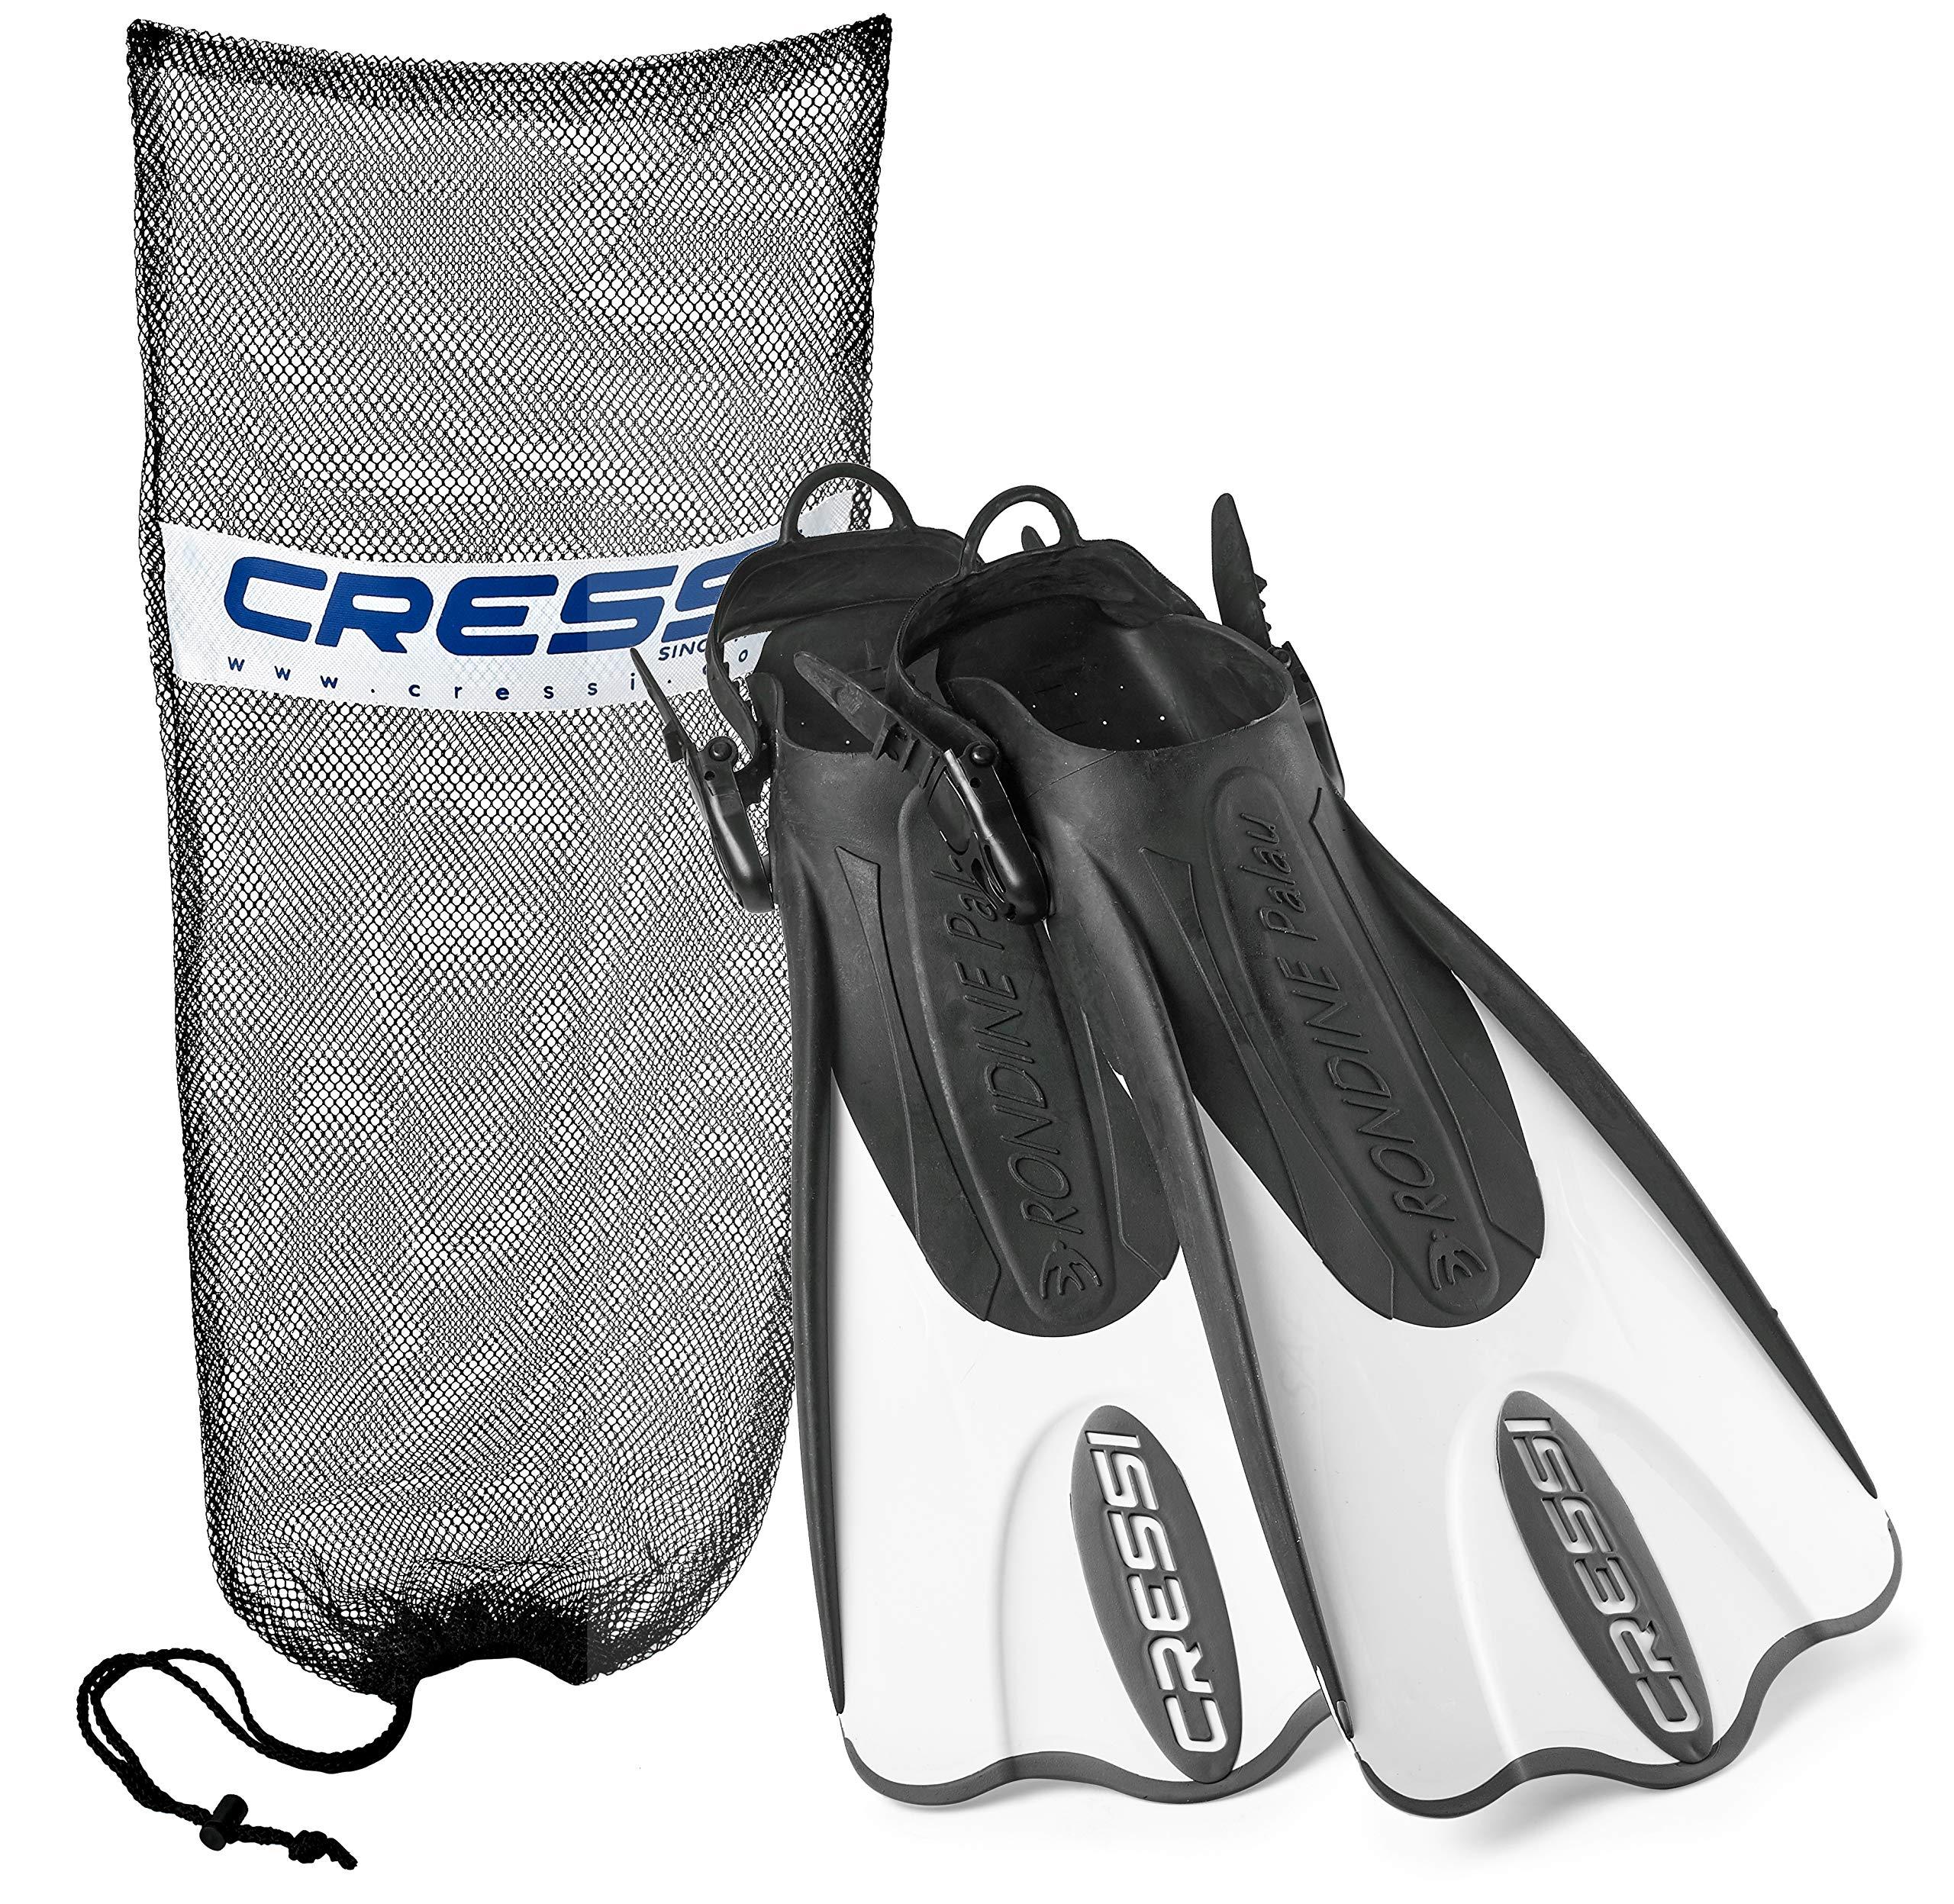 Cressi Palau Short Snorkeling Swim Fins with Mesh Bag (Black White, Medium/Large) by Cressi